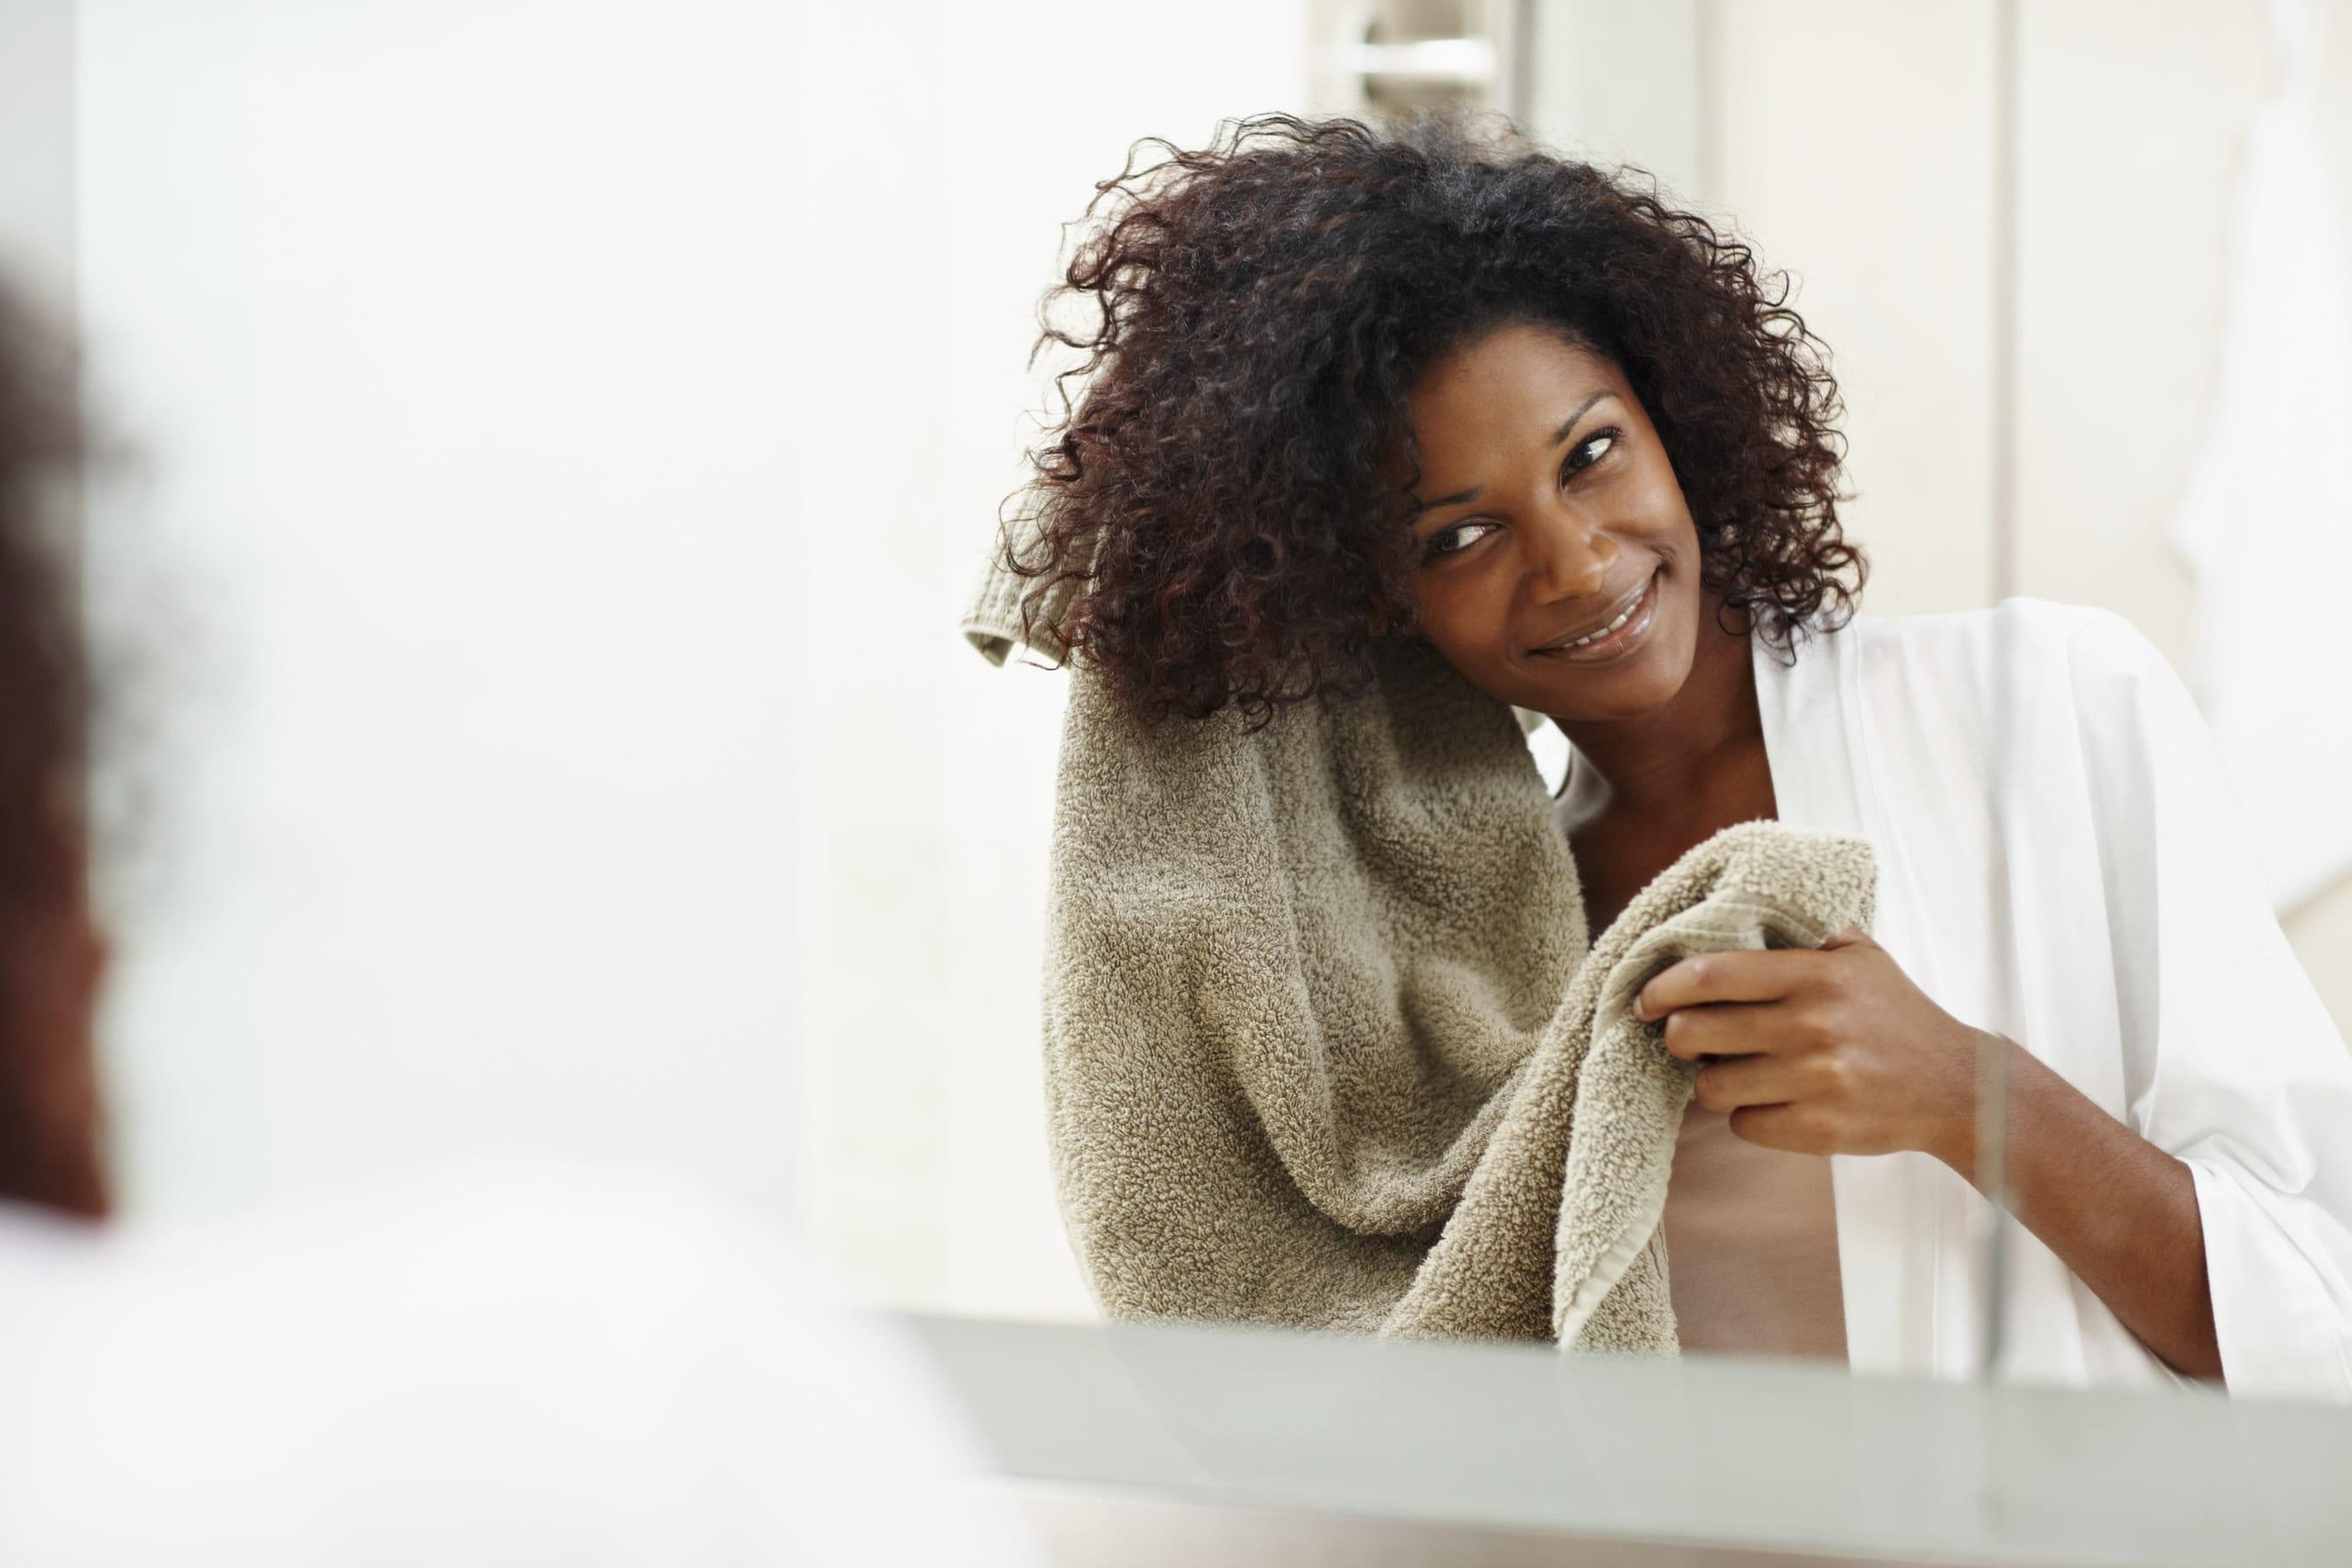 Shampoo: All Things Hair - IMAGE -Black woman drying her natural hair